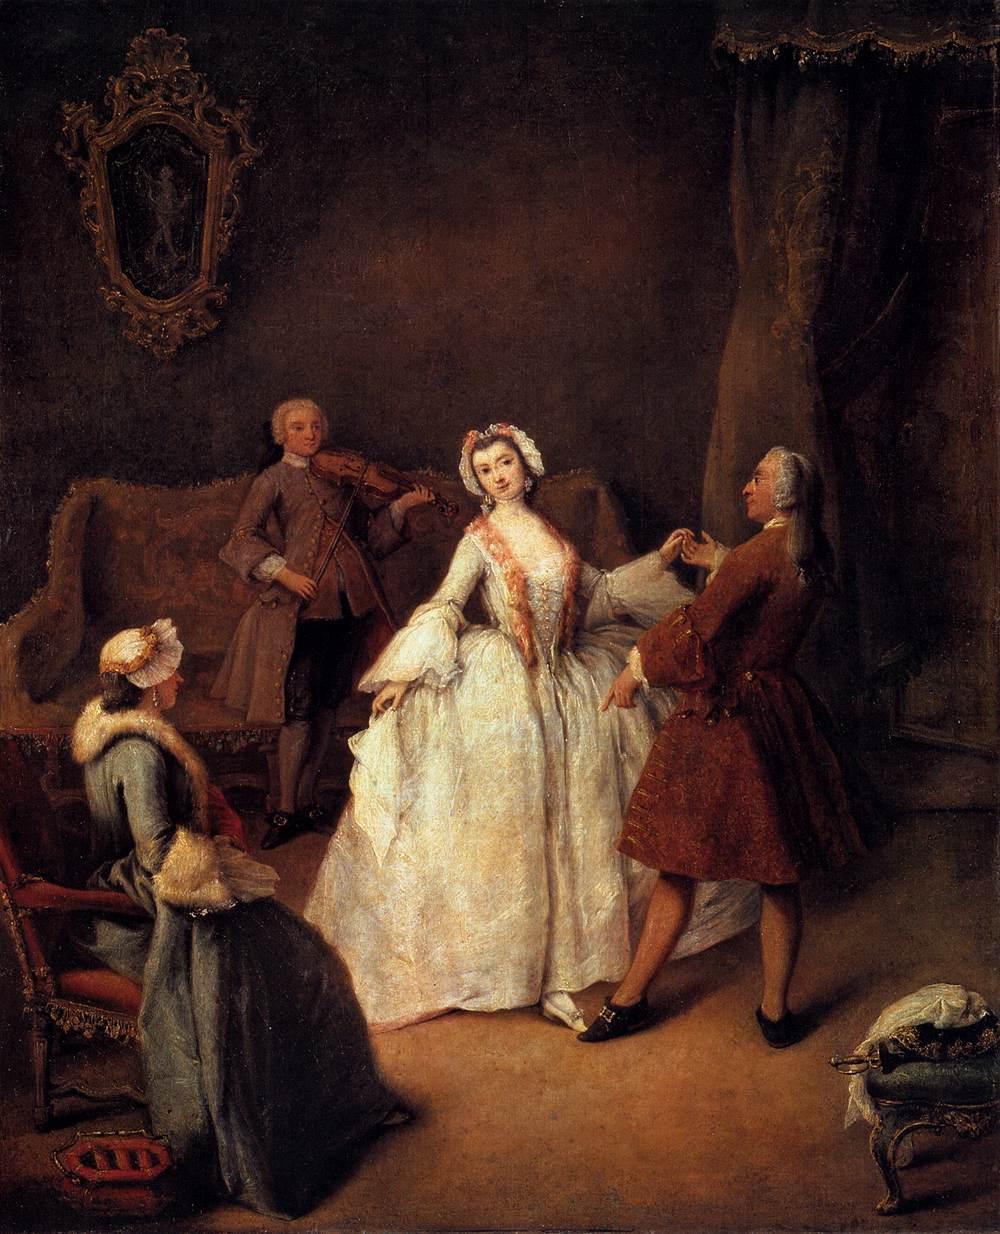 The Dancing Lesson, 1741, Pietro Longhi, Gallerie dell'Accademia (Venice, Italy)